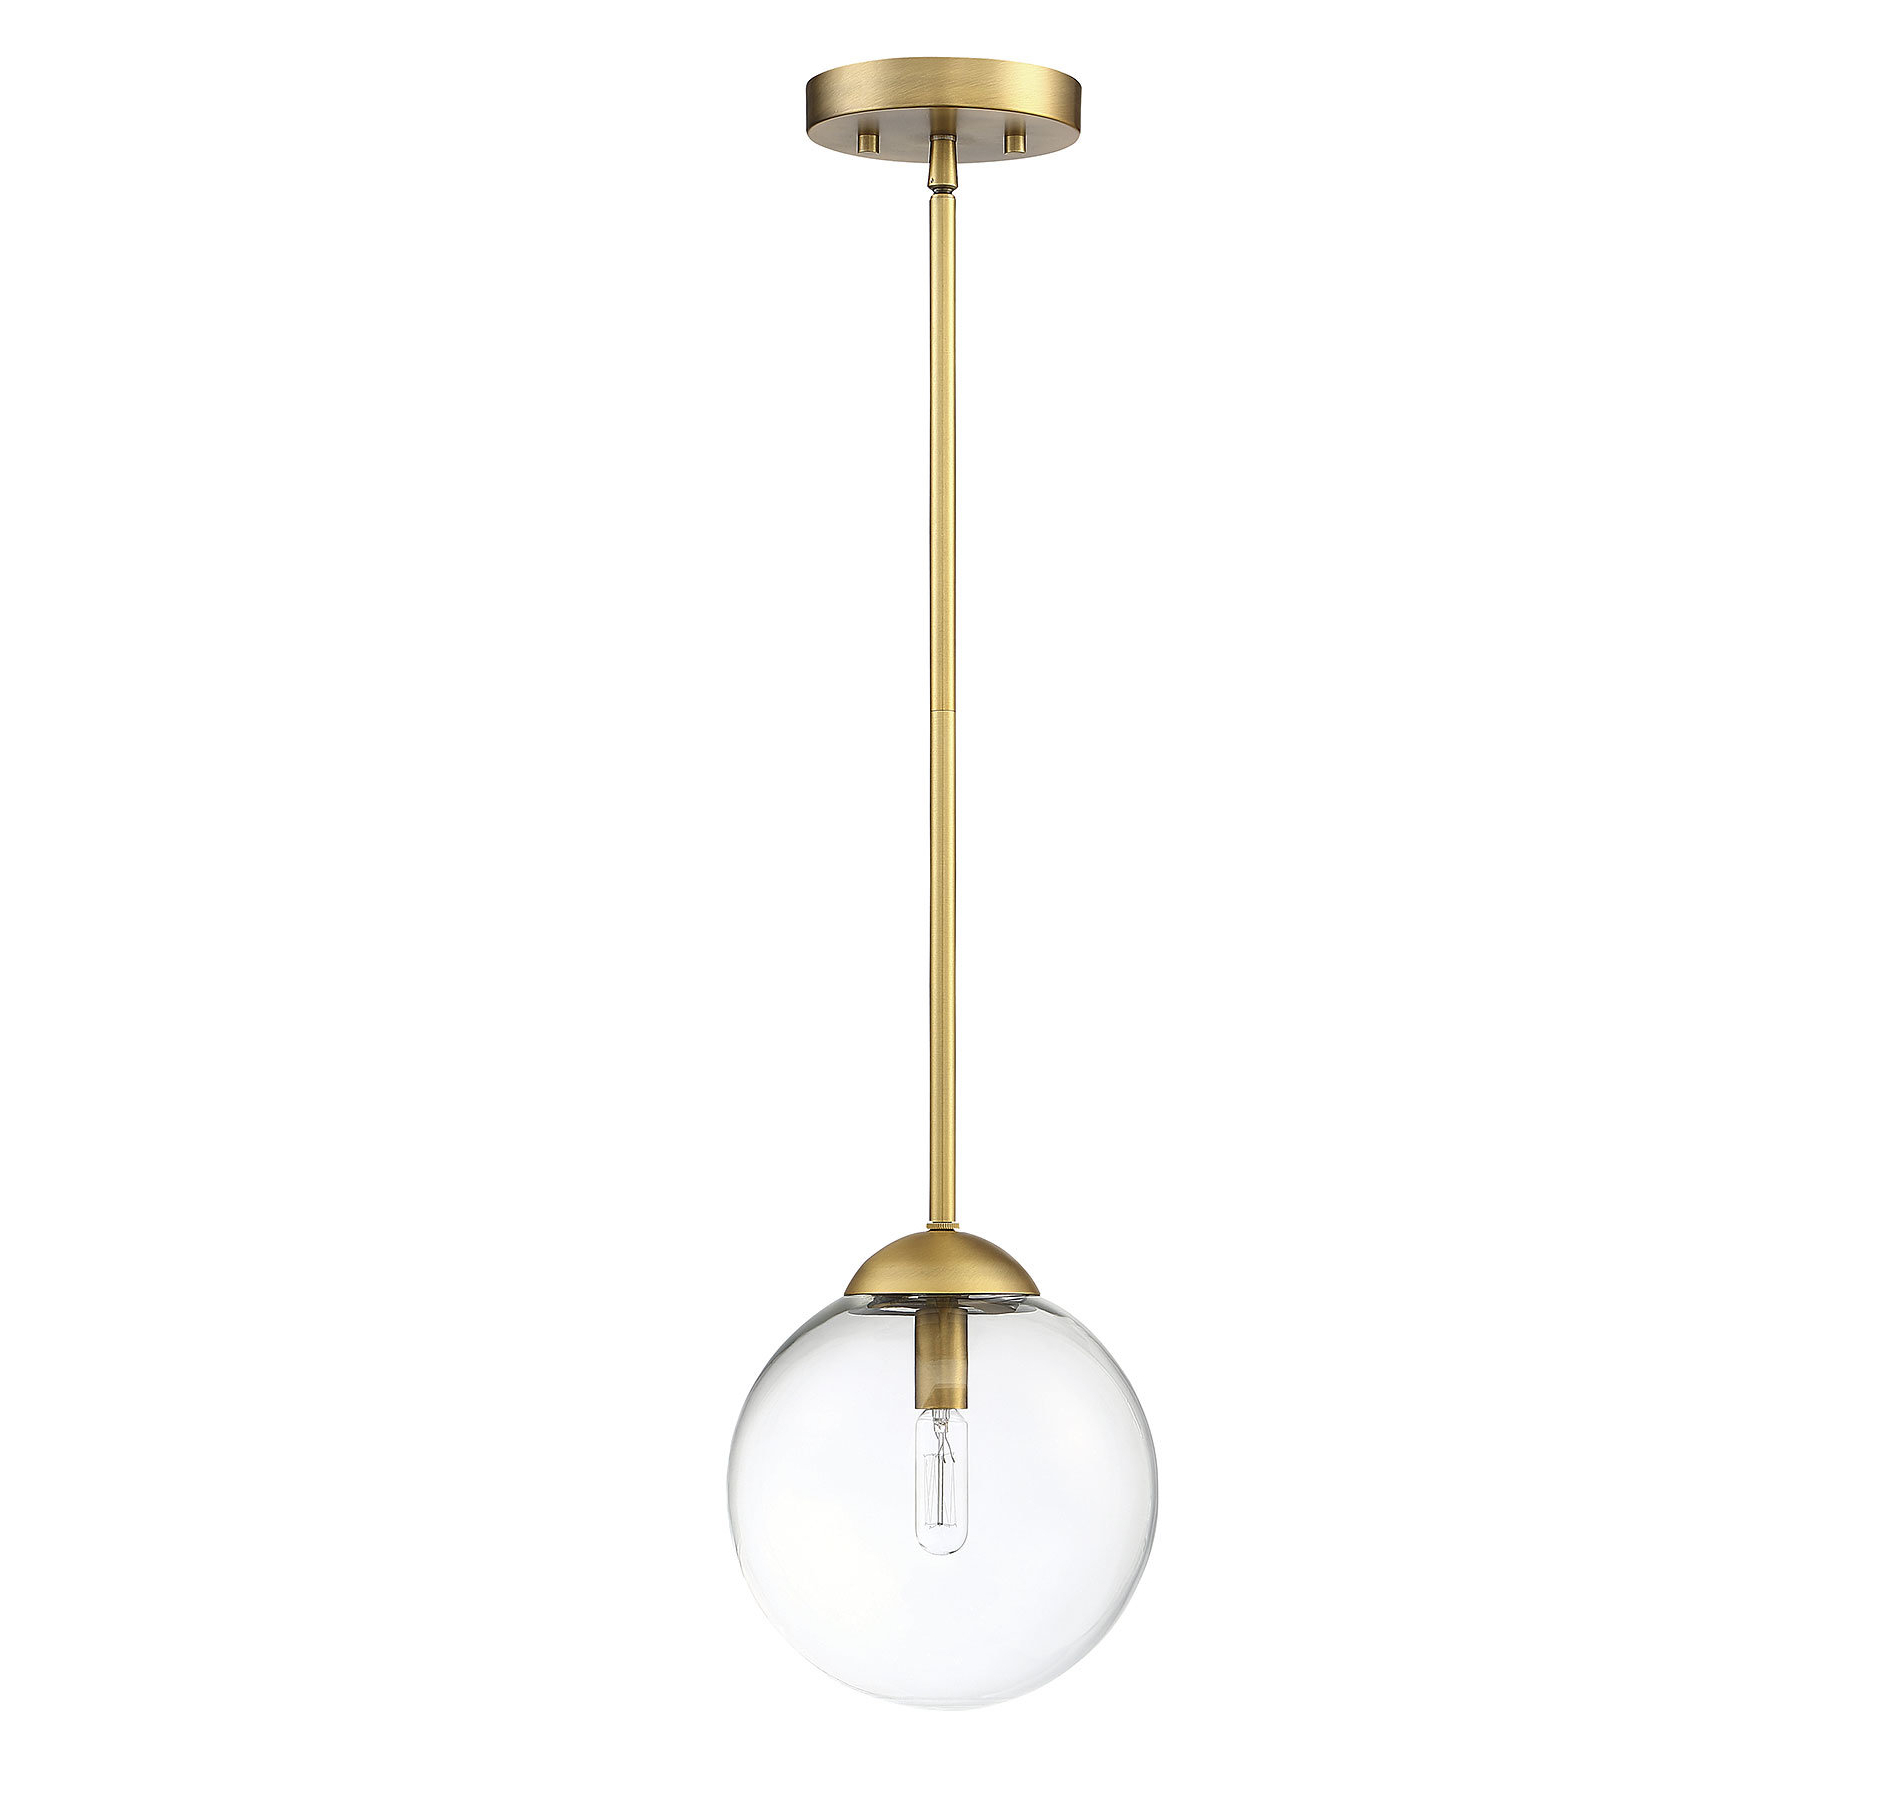 St Judes 1 Light Single Globe Pendant Regarding Current Cayden 1 Light Single Globe Pendants (View 23 of 25)